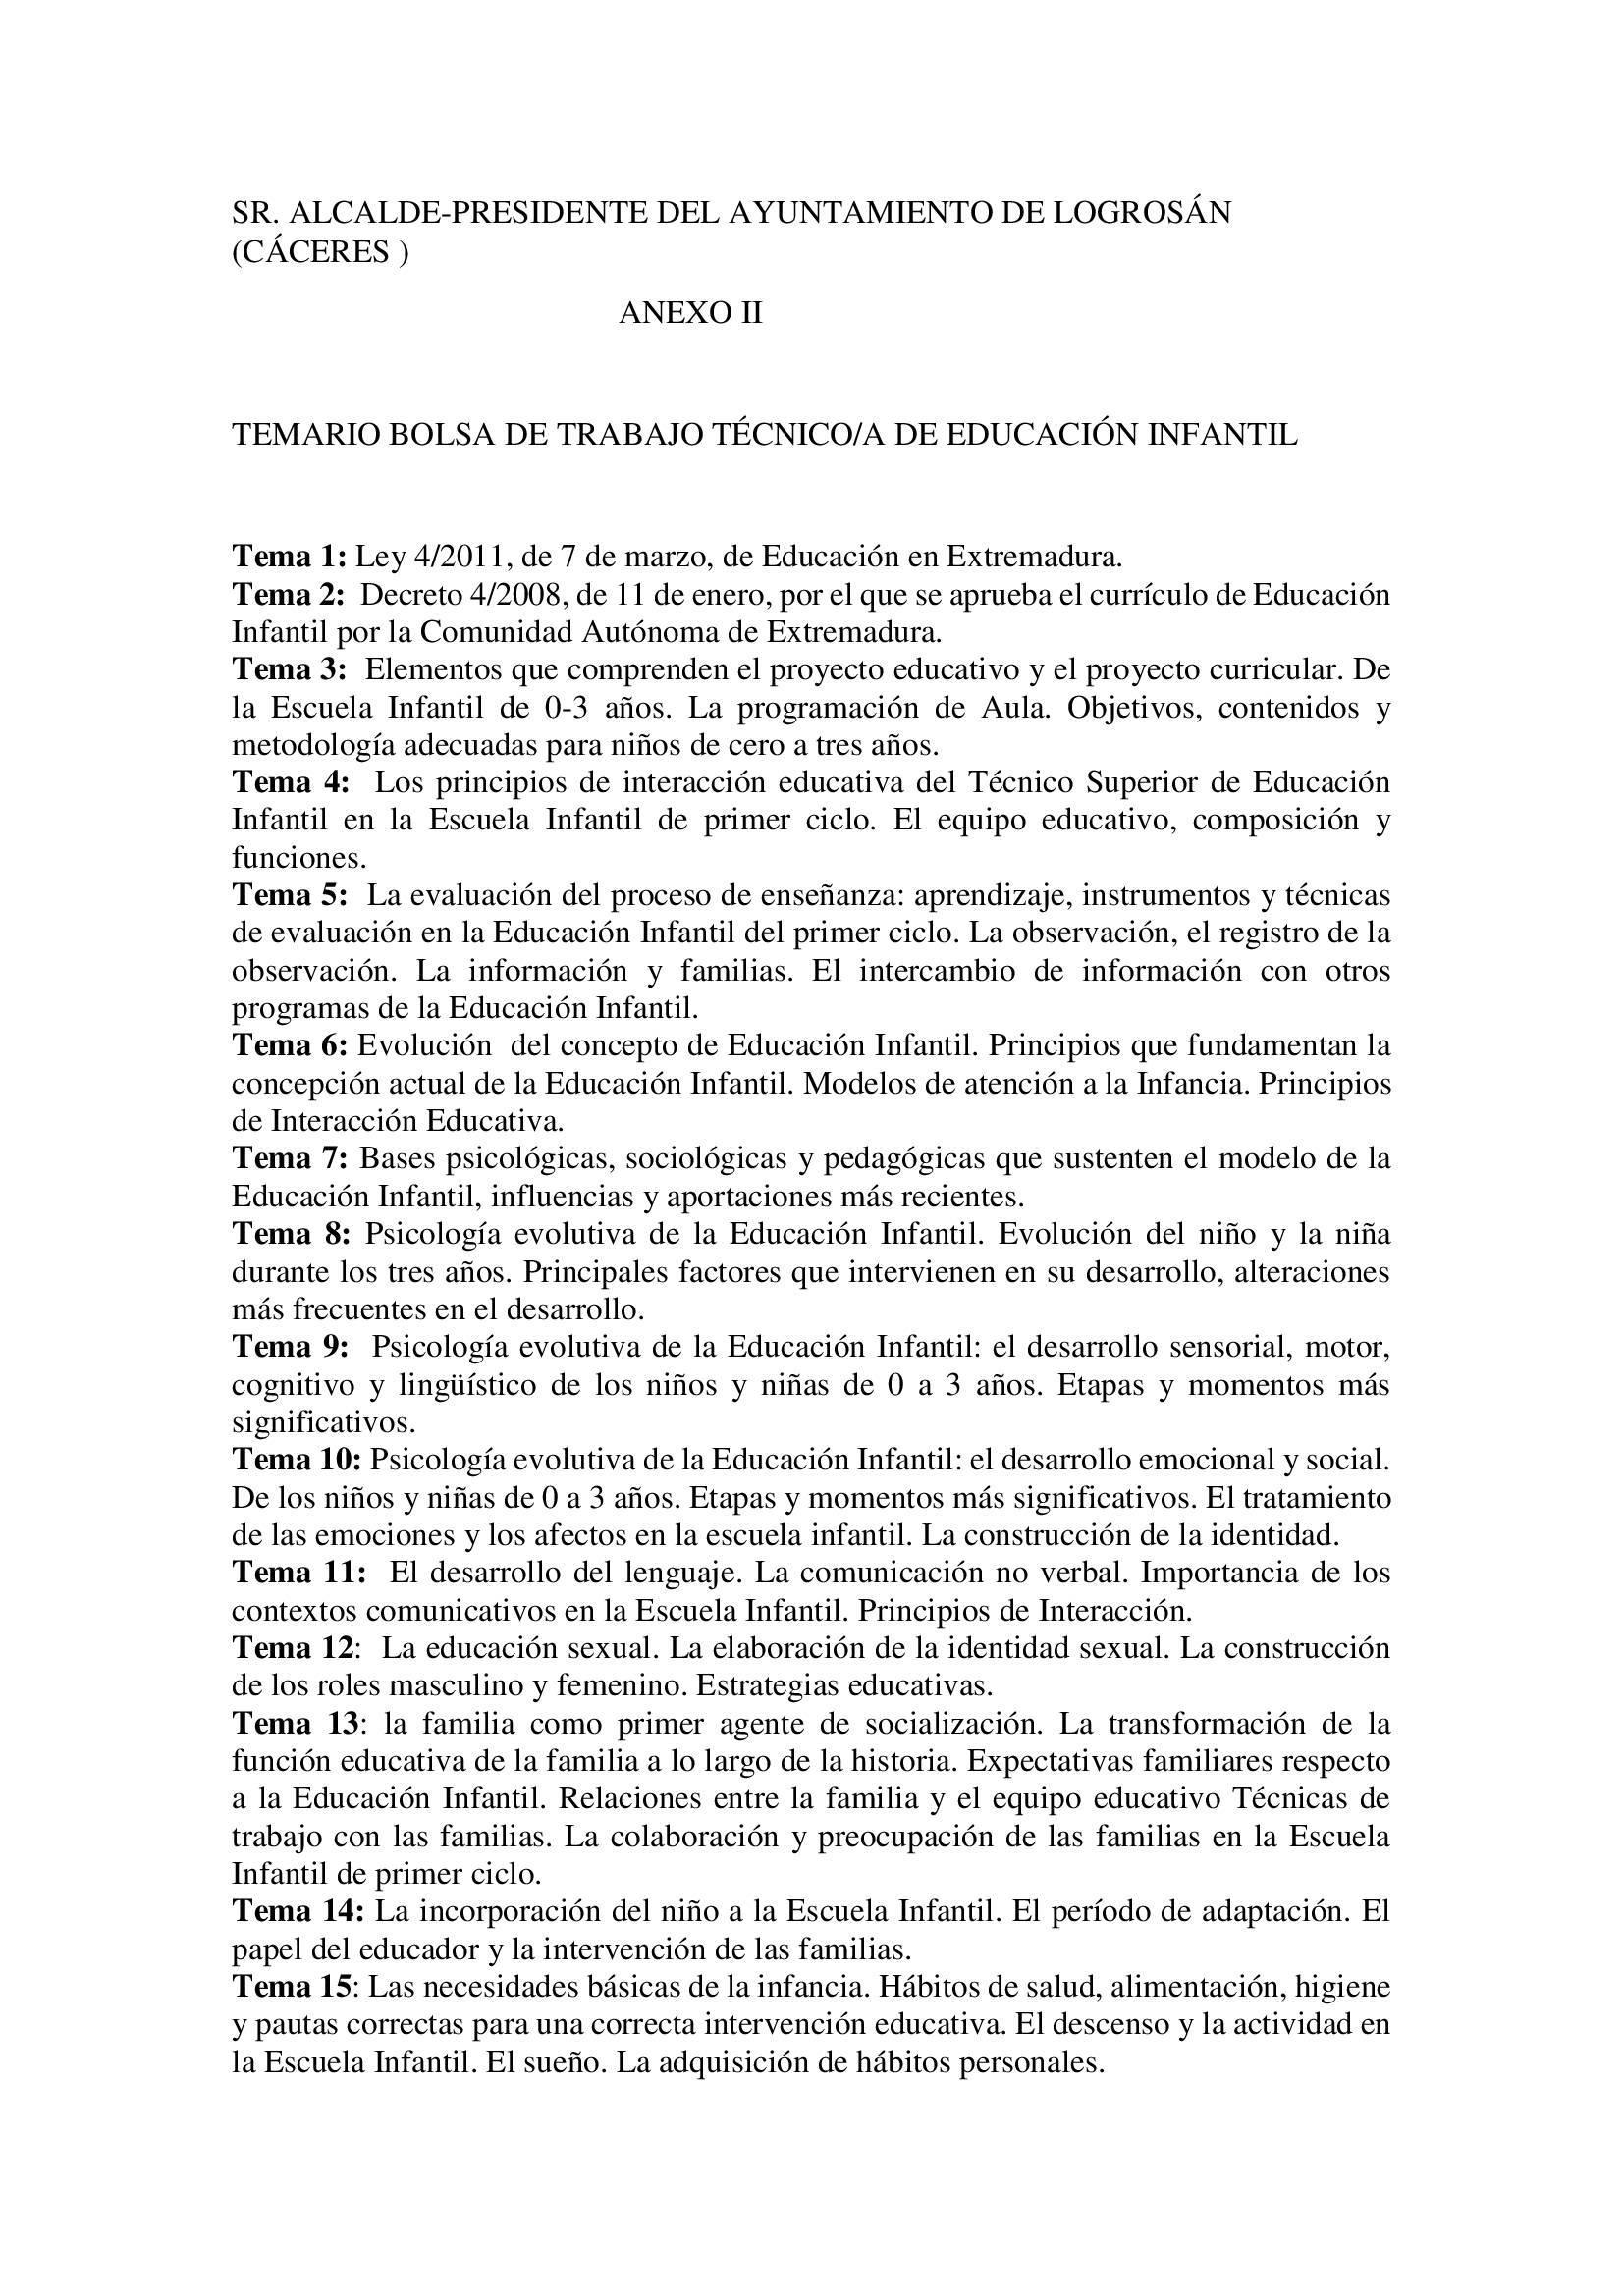 Bolsa de técnicos-as en educación infantil (2021) - Logrosán (Cáceres) 13